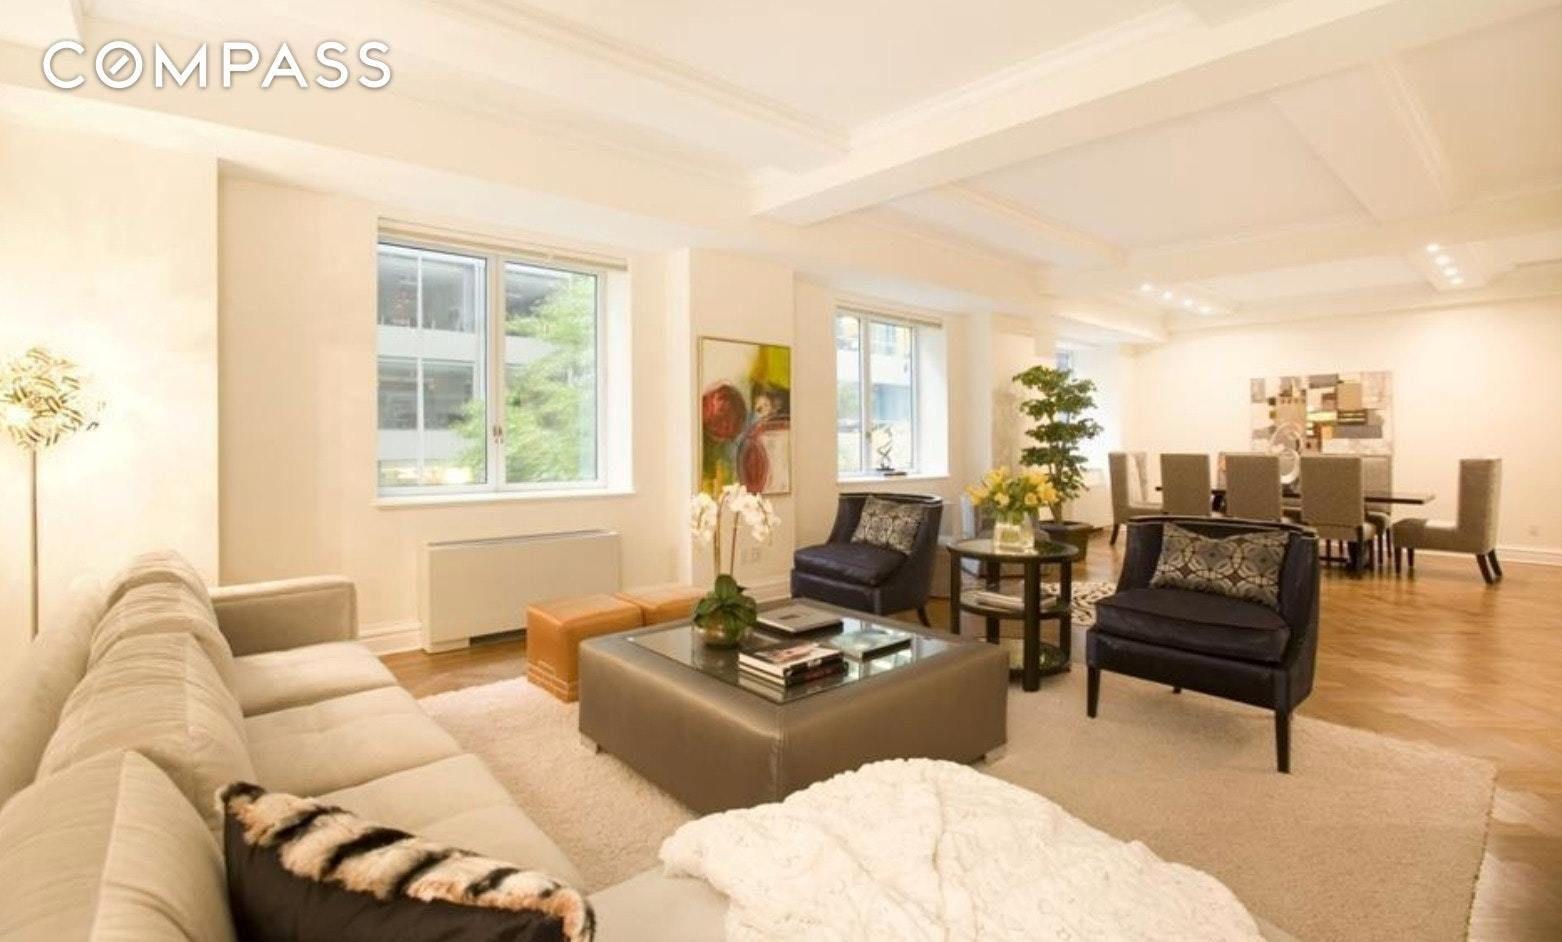 Apartment for sale at 502 Park Avenue, Apt 3-B